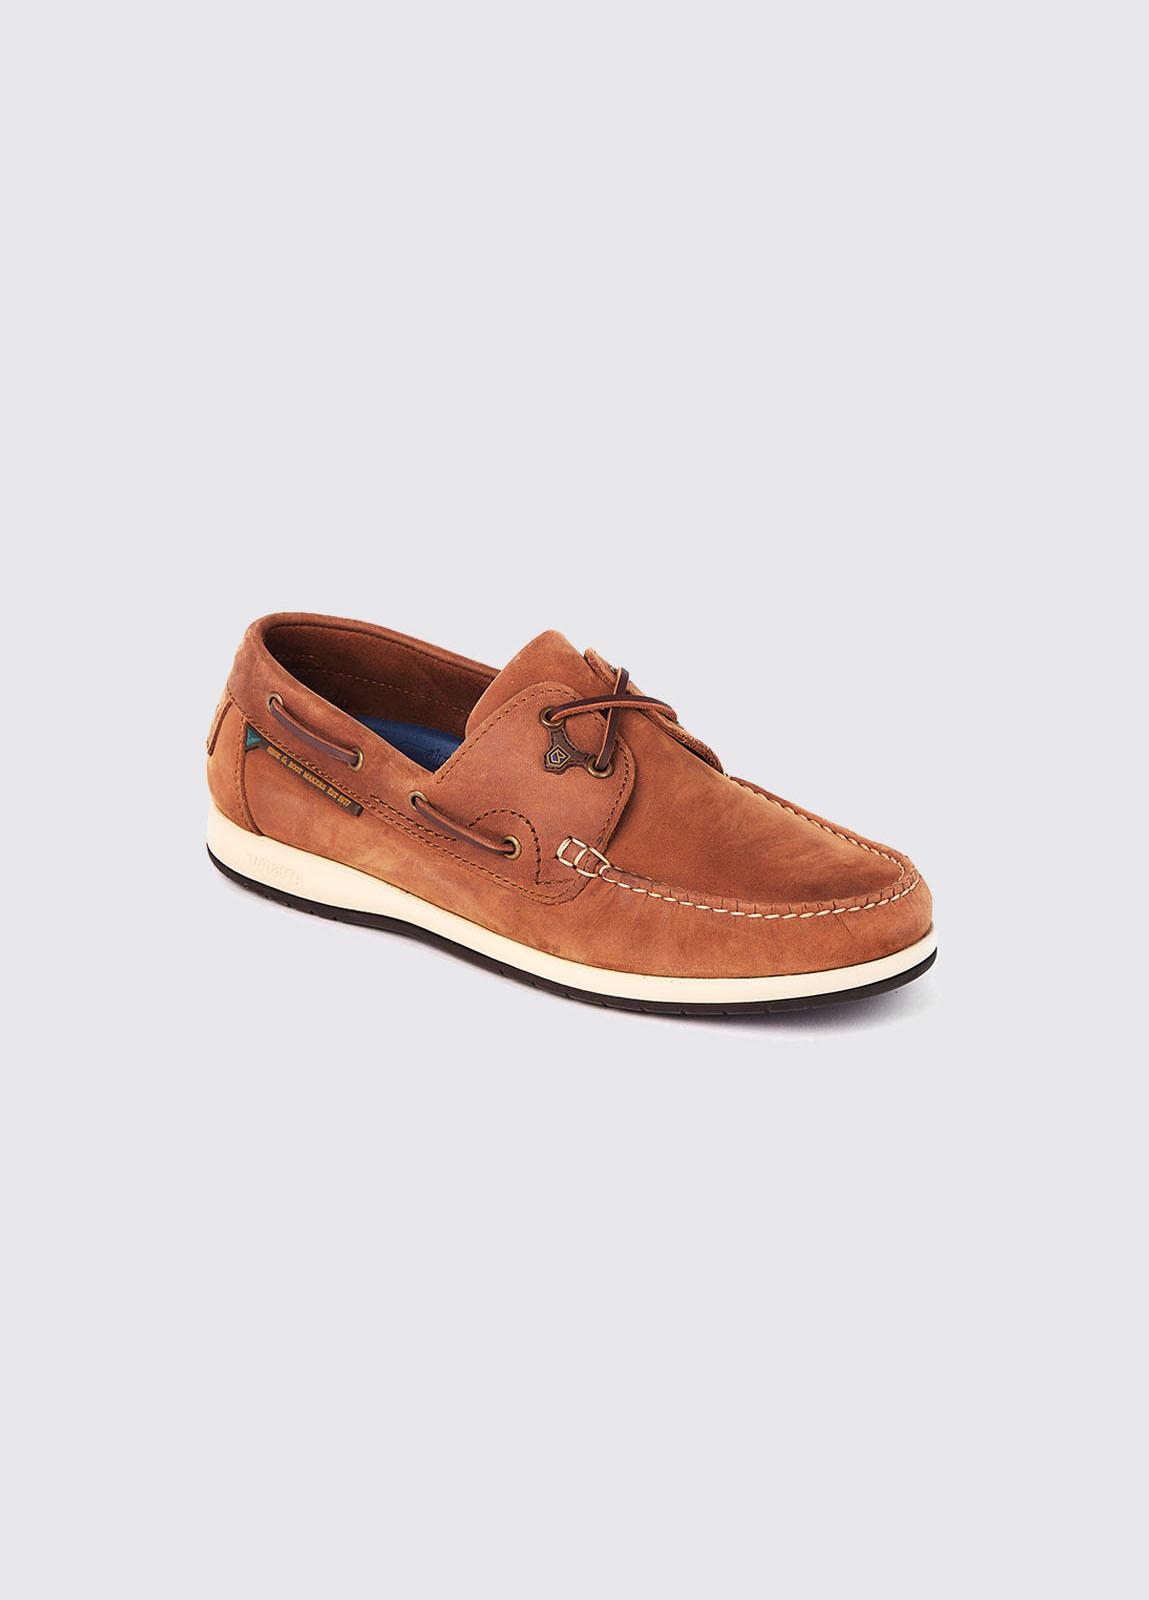 Sailmaker X LT Deck Shoe - Tan